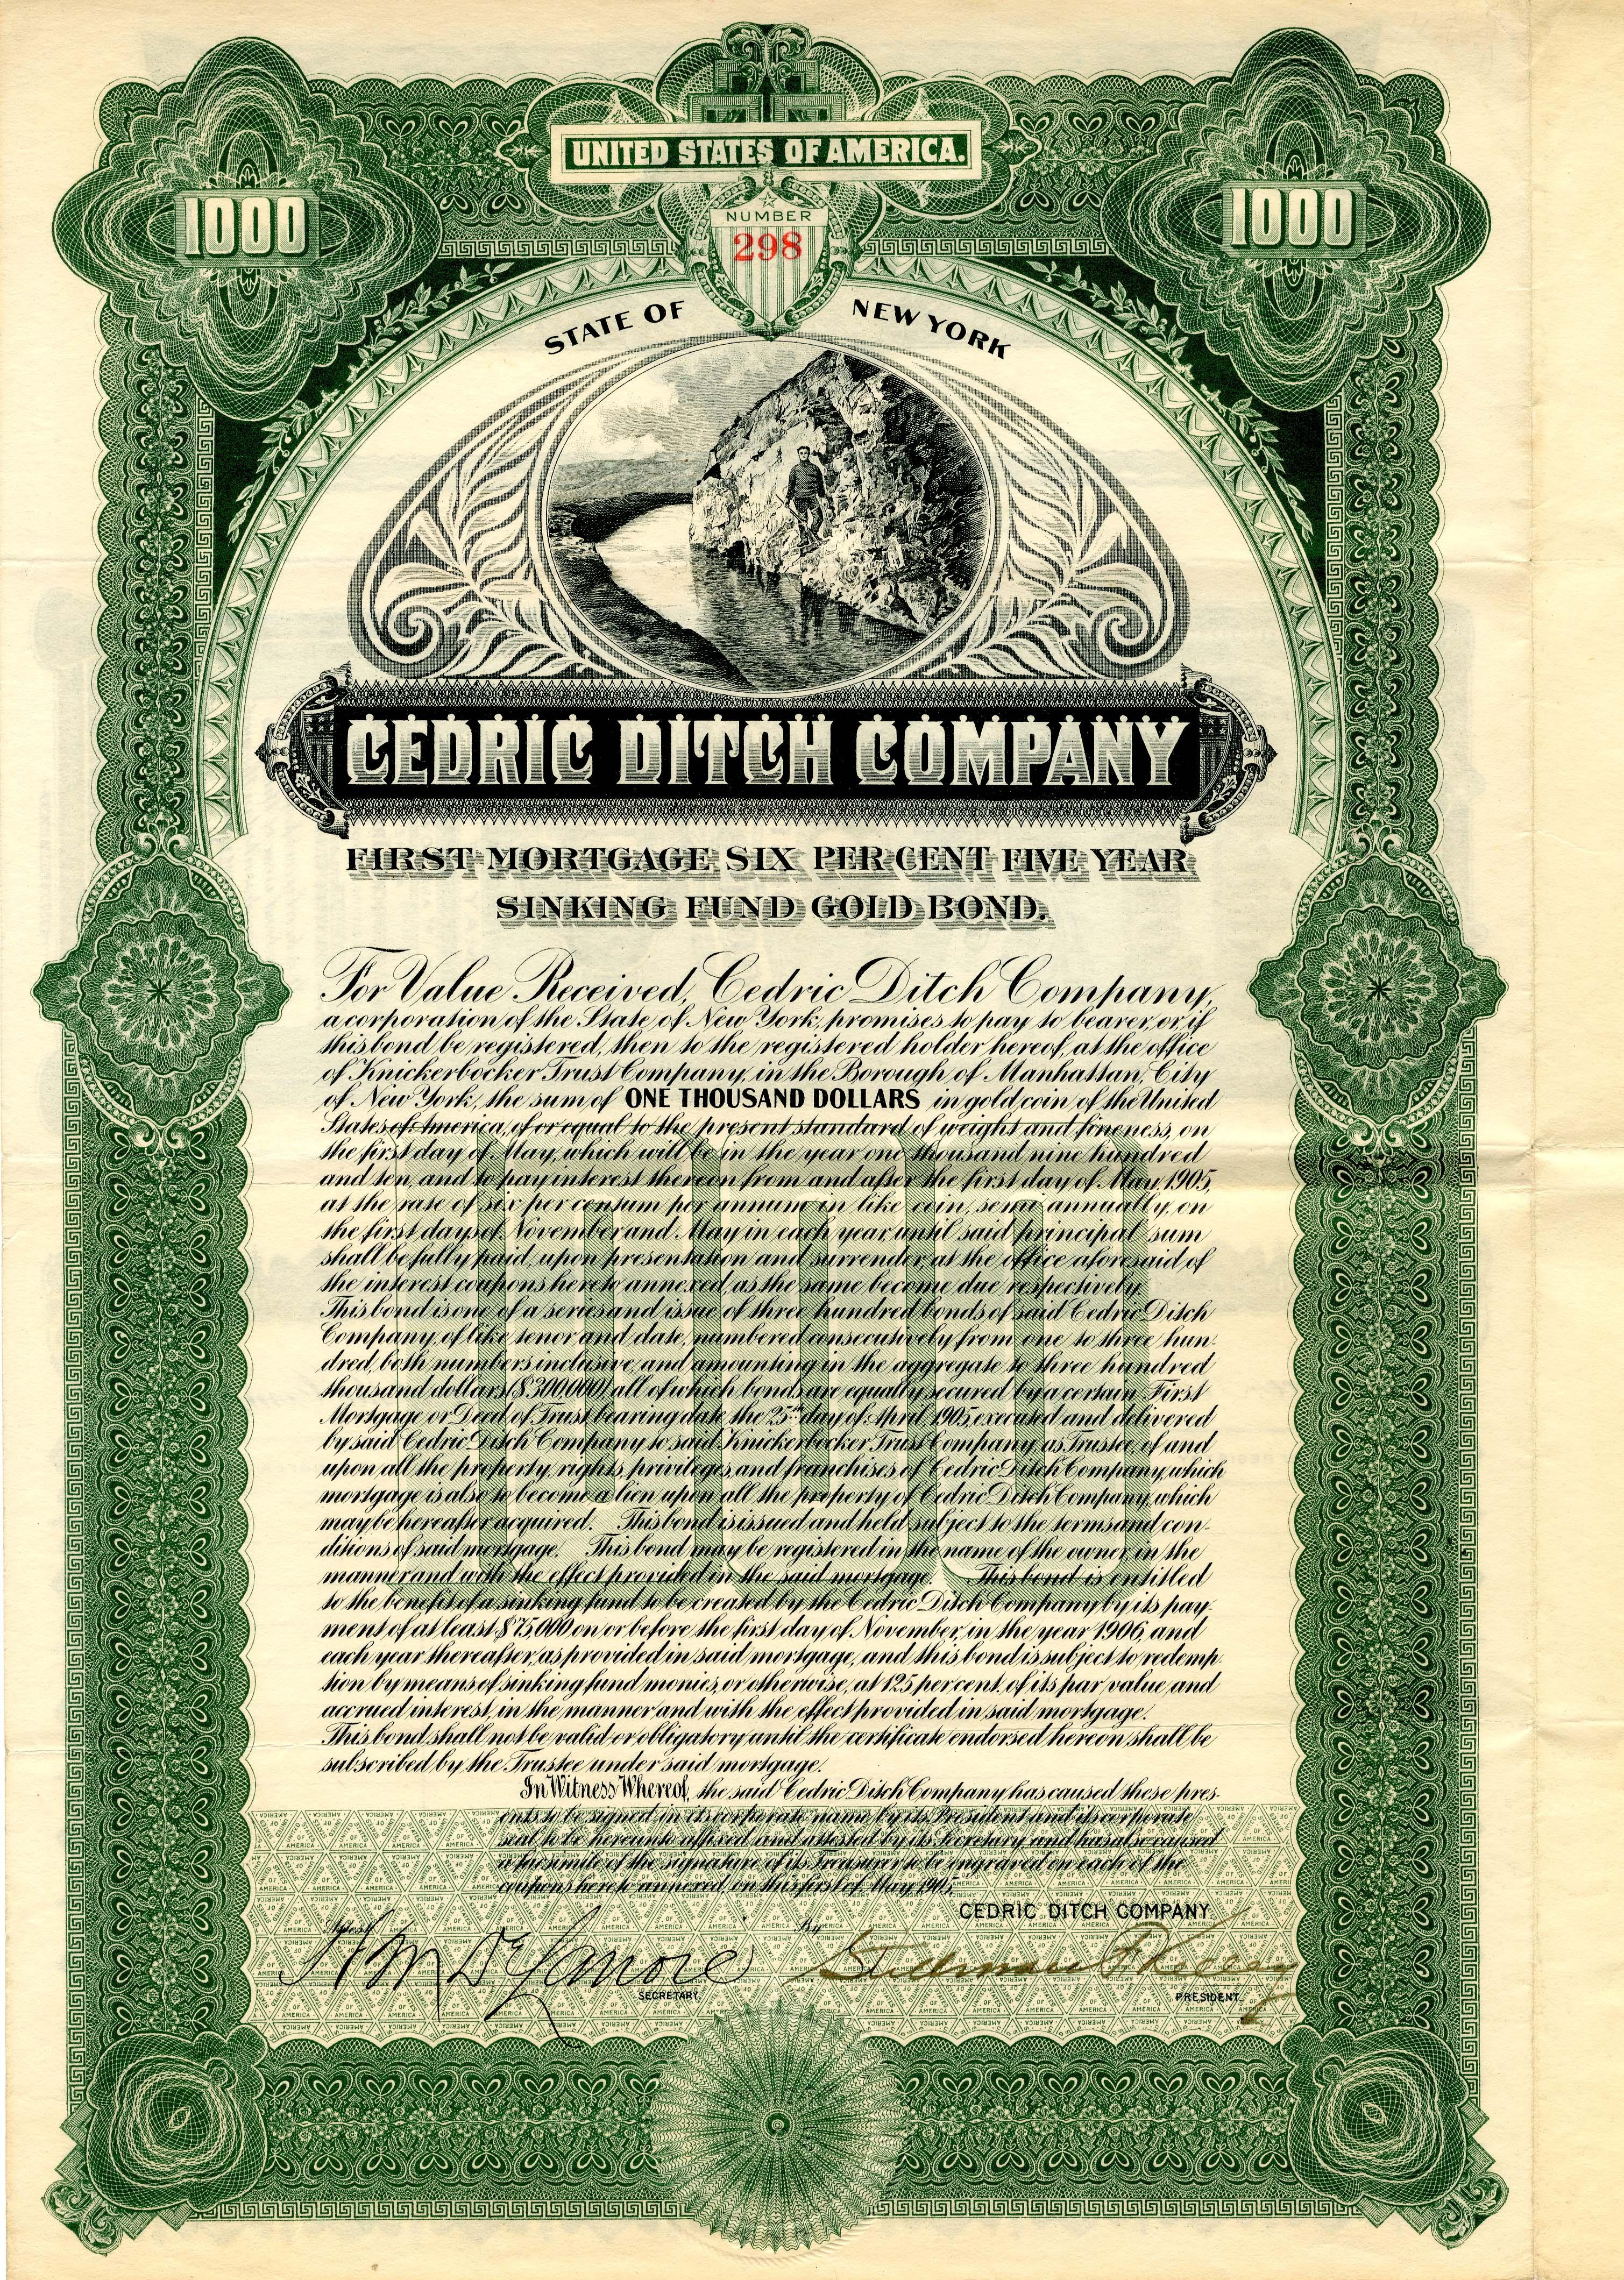 Cedric Ditch Company - $1,000